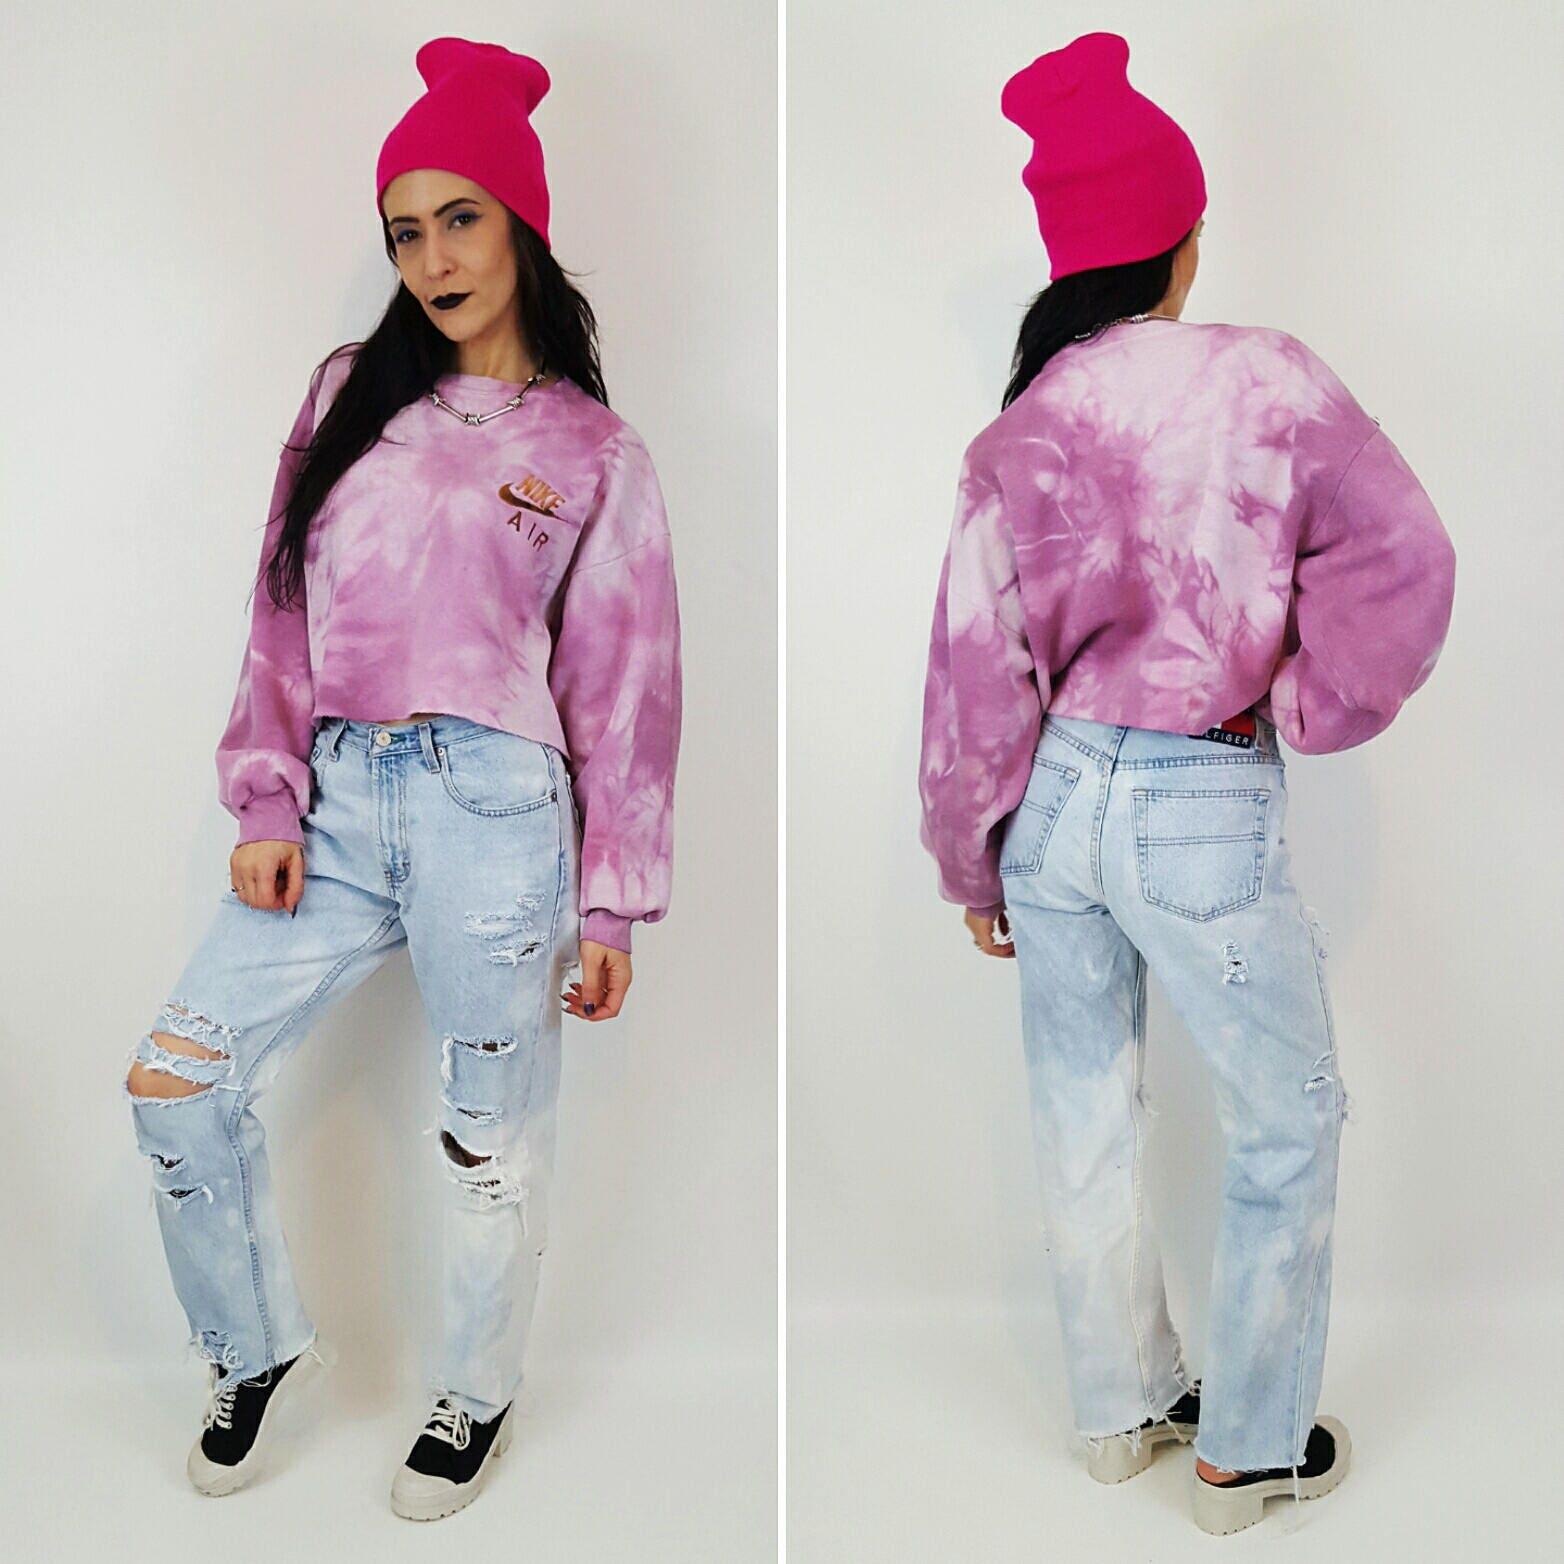 10f6104f6139f Nike Pink Tiedye Cropped Sweatshirt - Large Oversized Baggy Crop Top  Sweatshirt - Logo Grunge Athletic Sweat Shirt - Raw Hem Tie Dye Croptop.  gallery photo ...